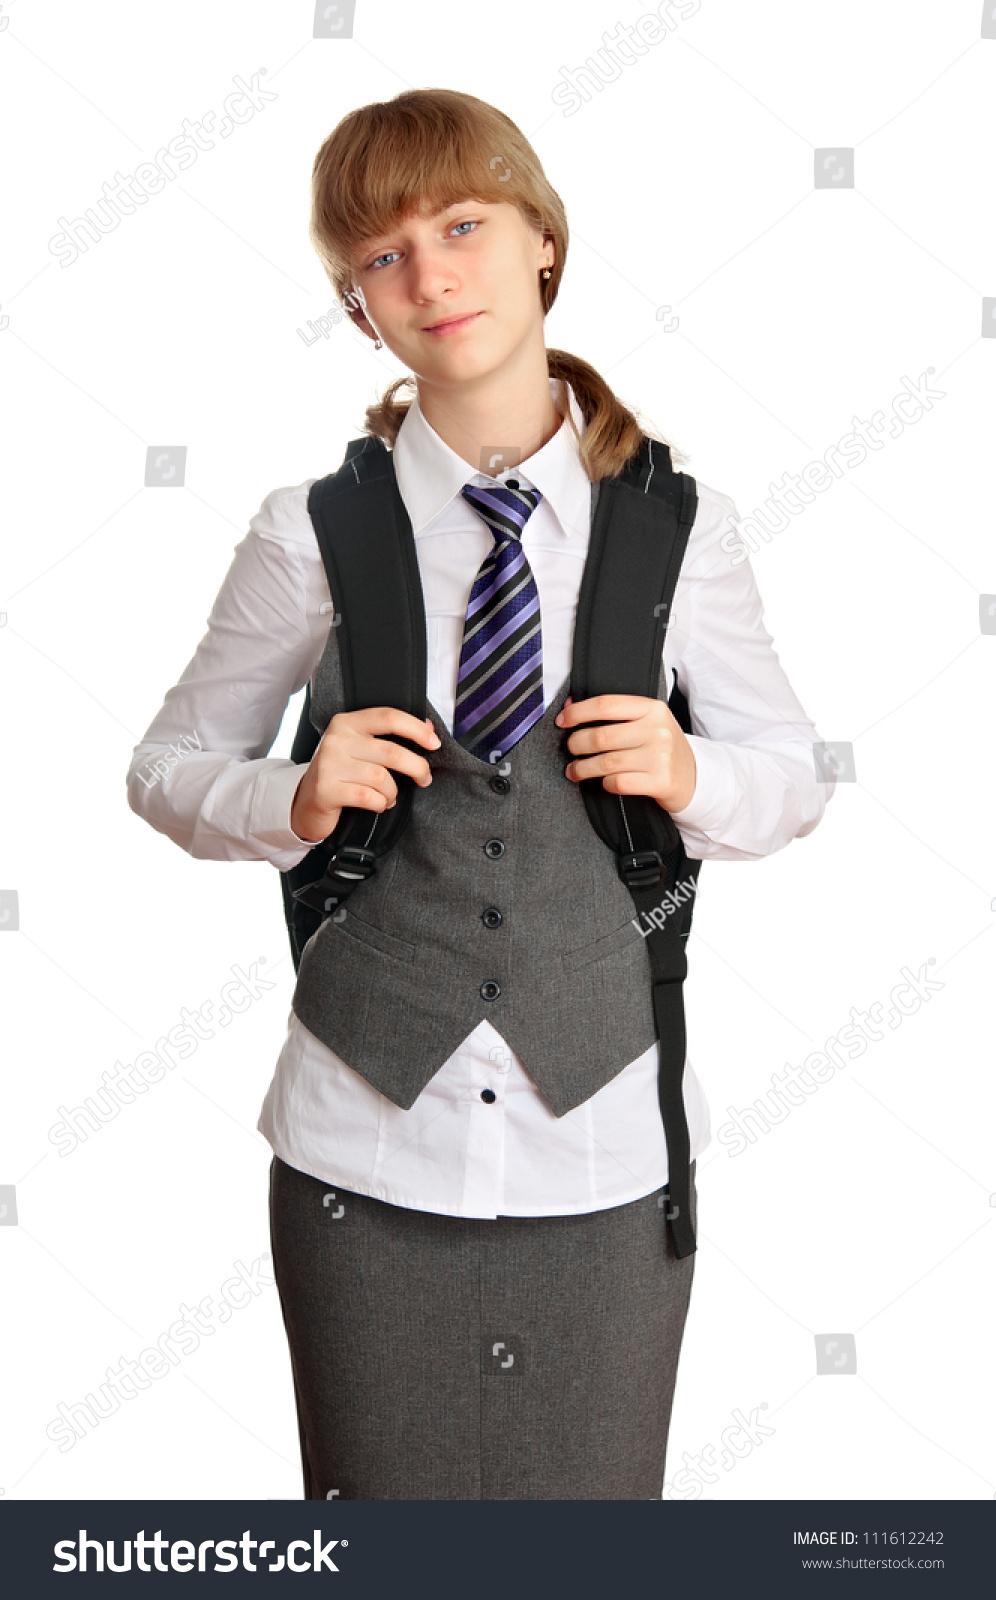 Uniform Image 29